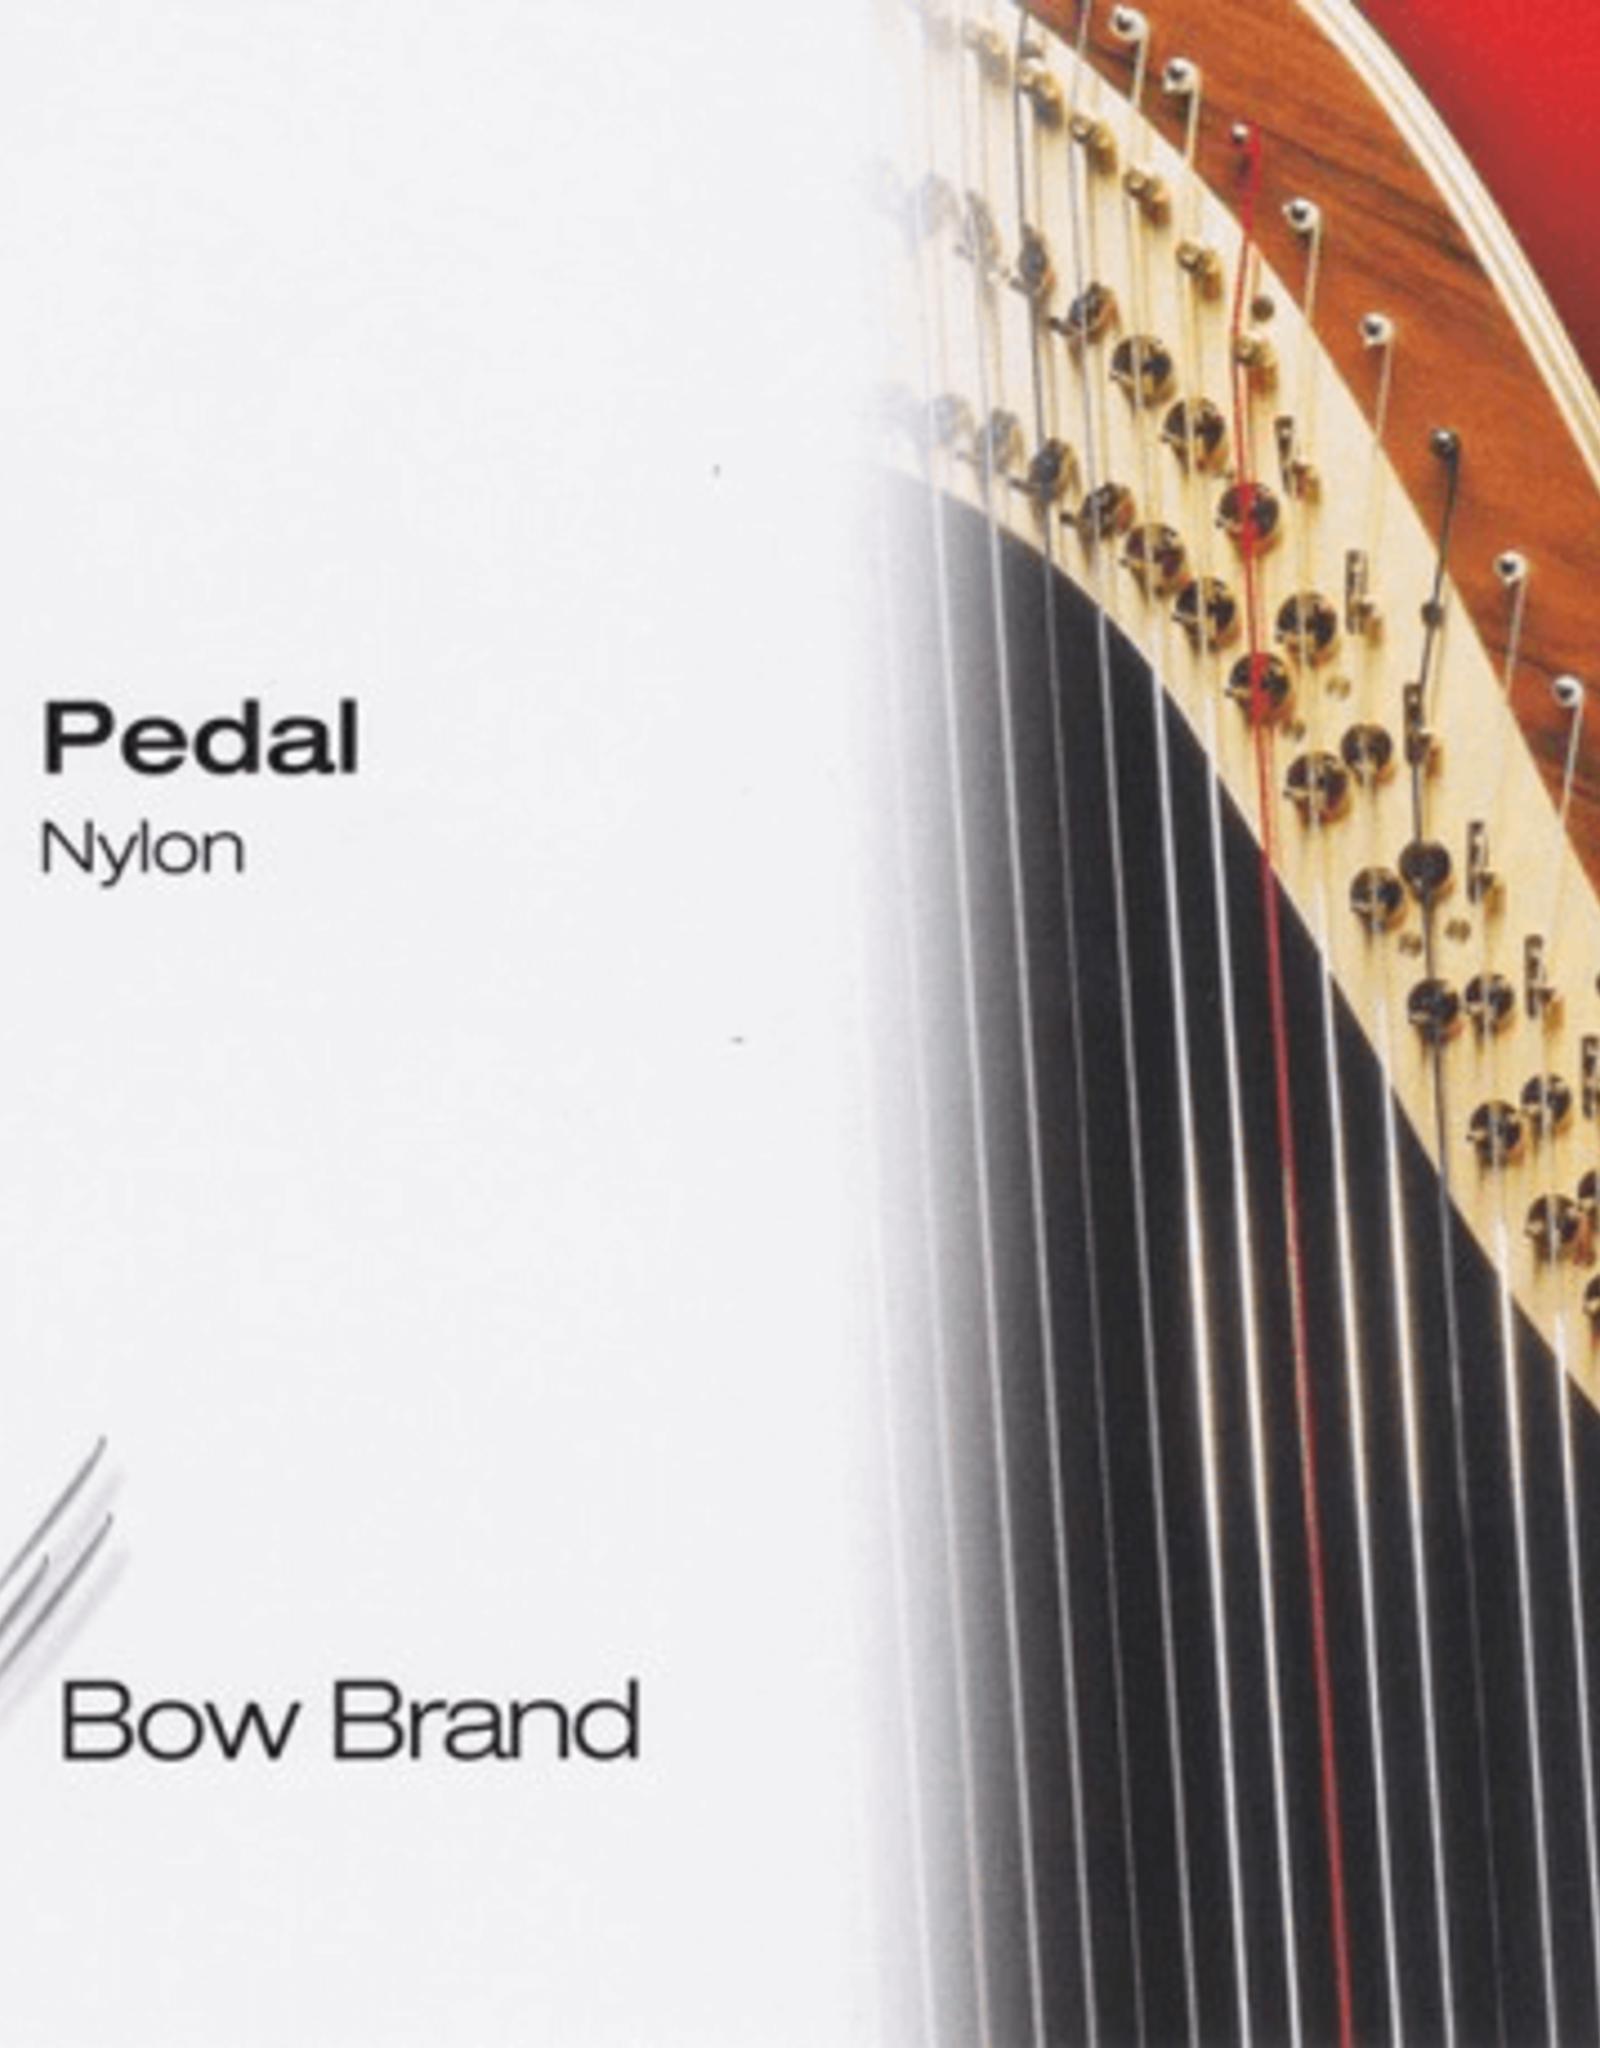 BOW BRAND  pedaal nylon - pedal NYLON 12/2 la